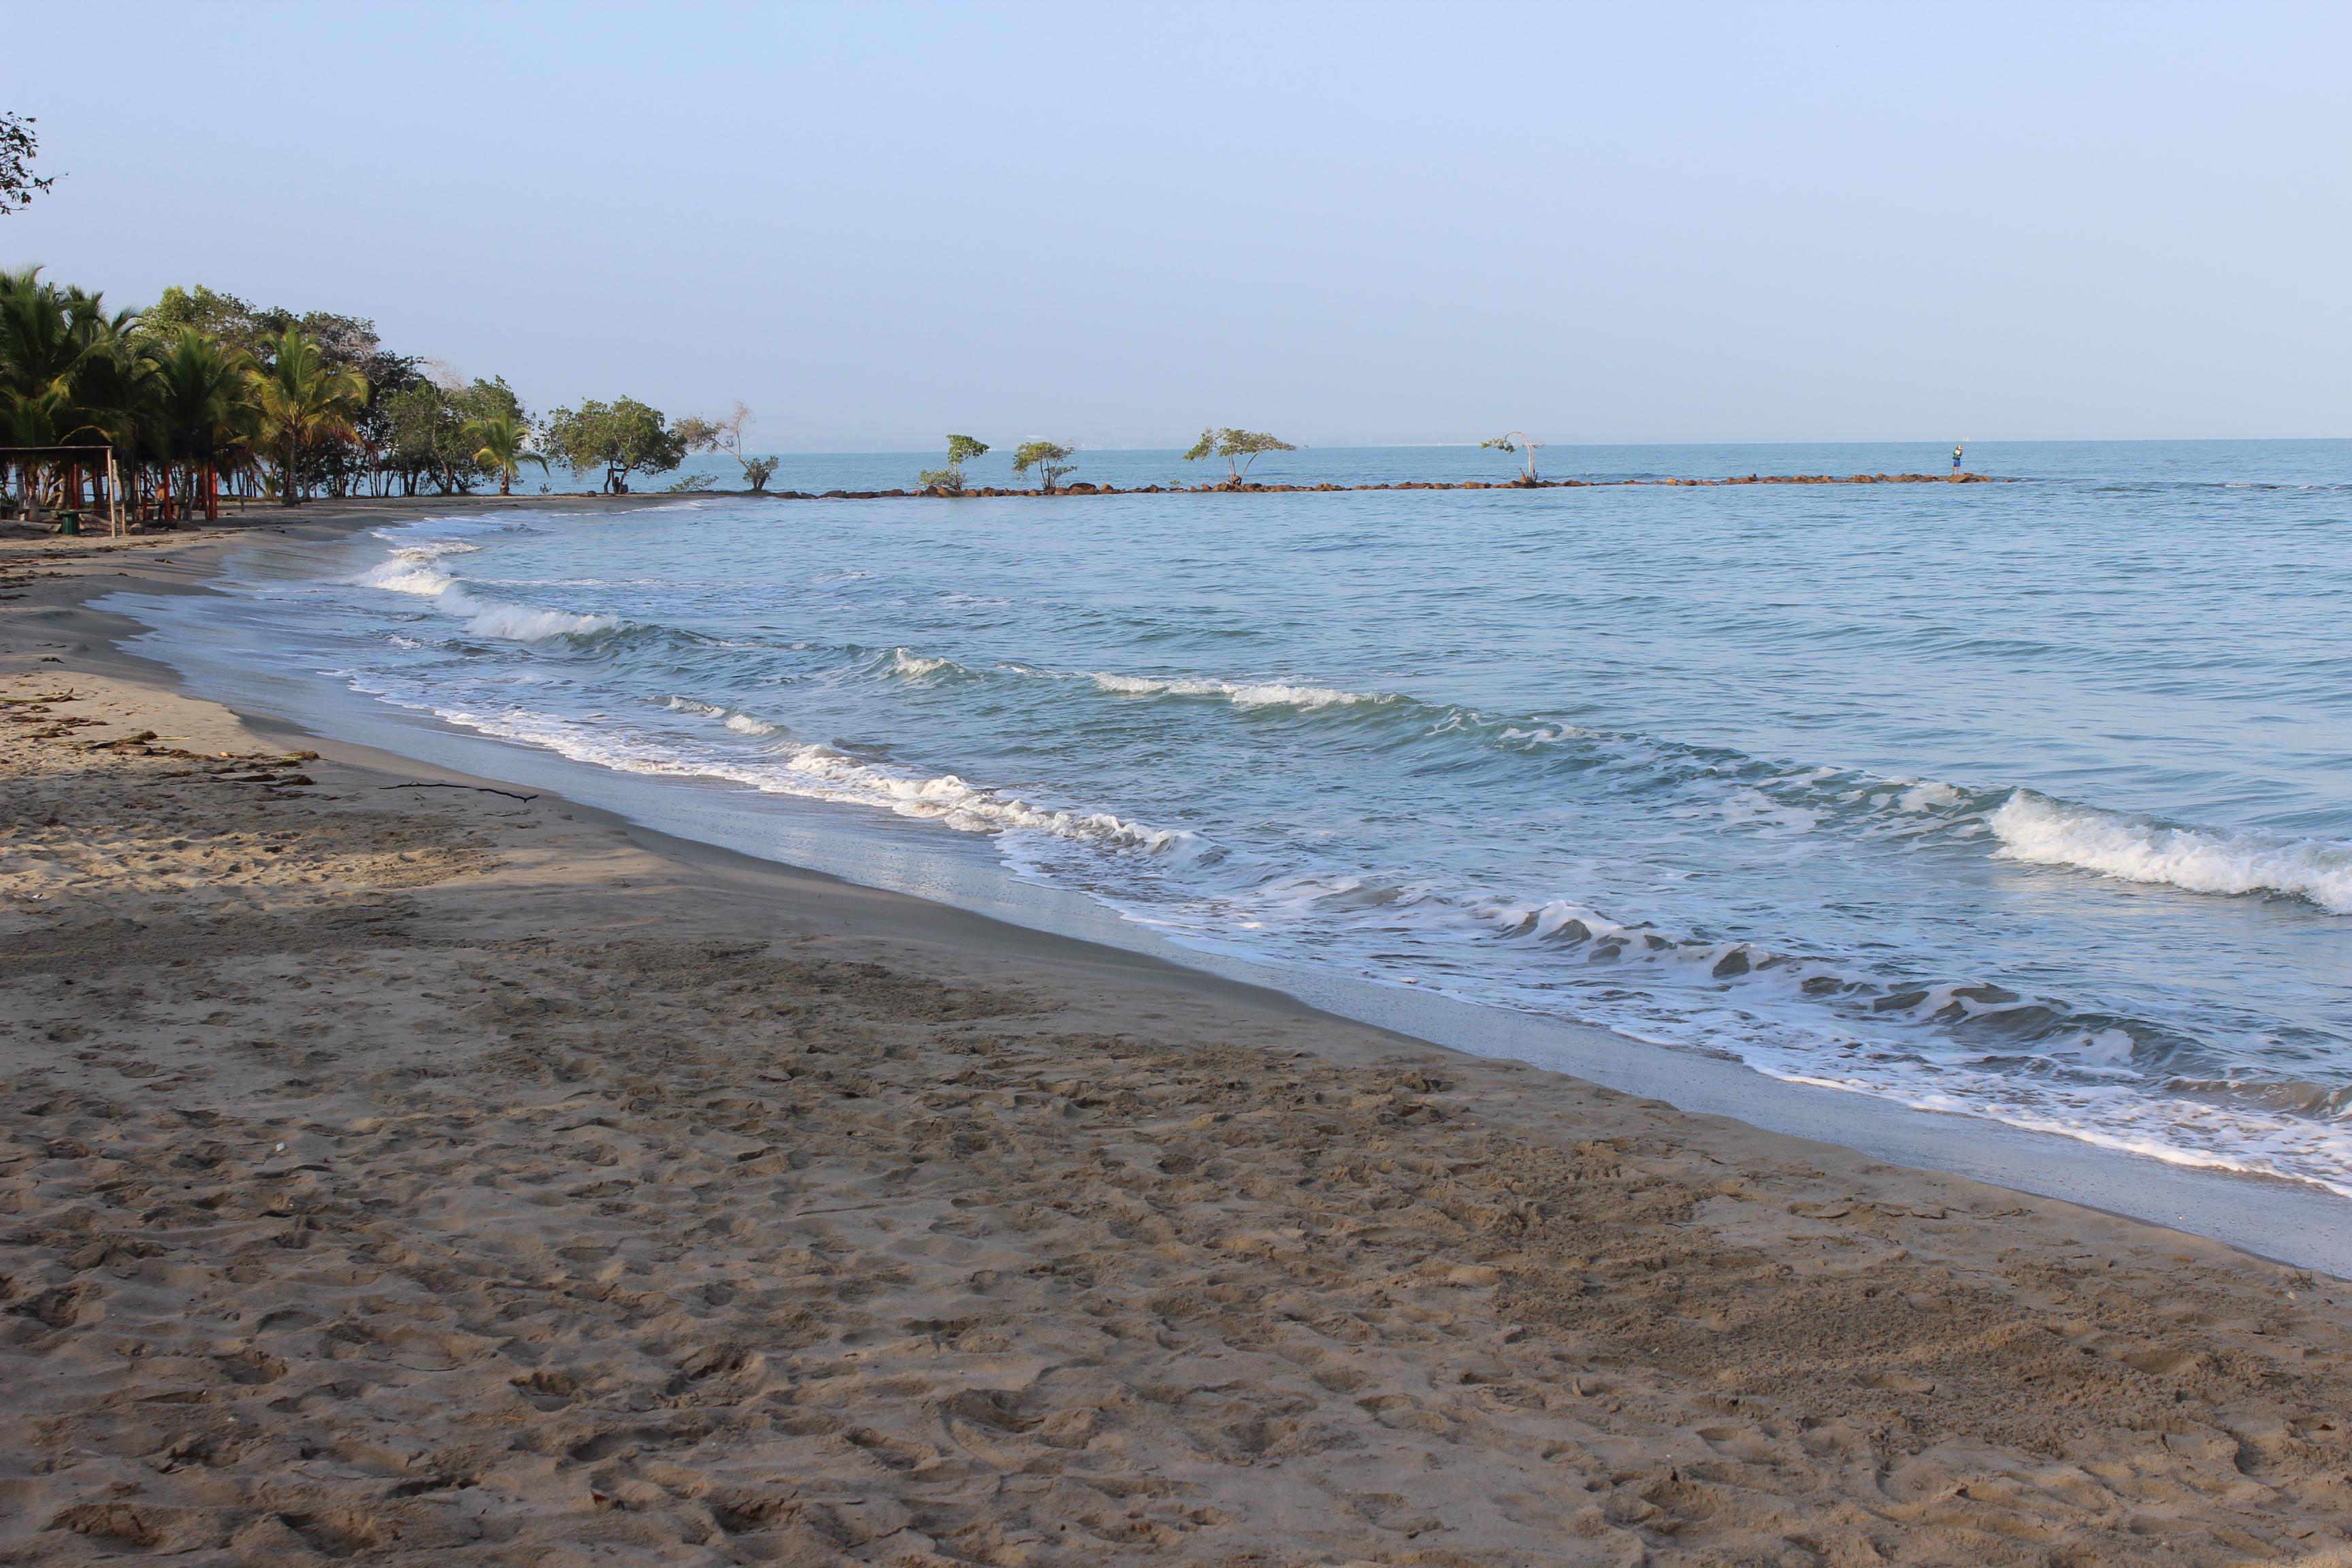 Nuestra playa Camino Palmero Coveñas